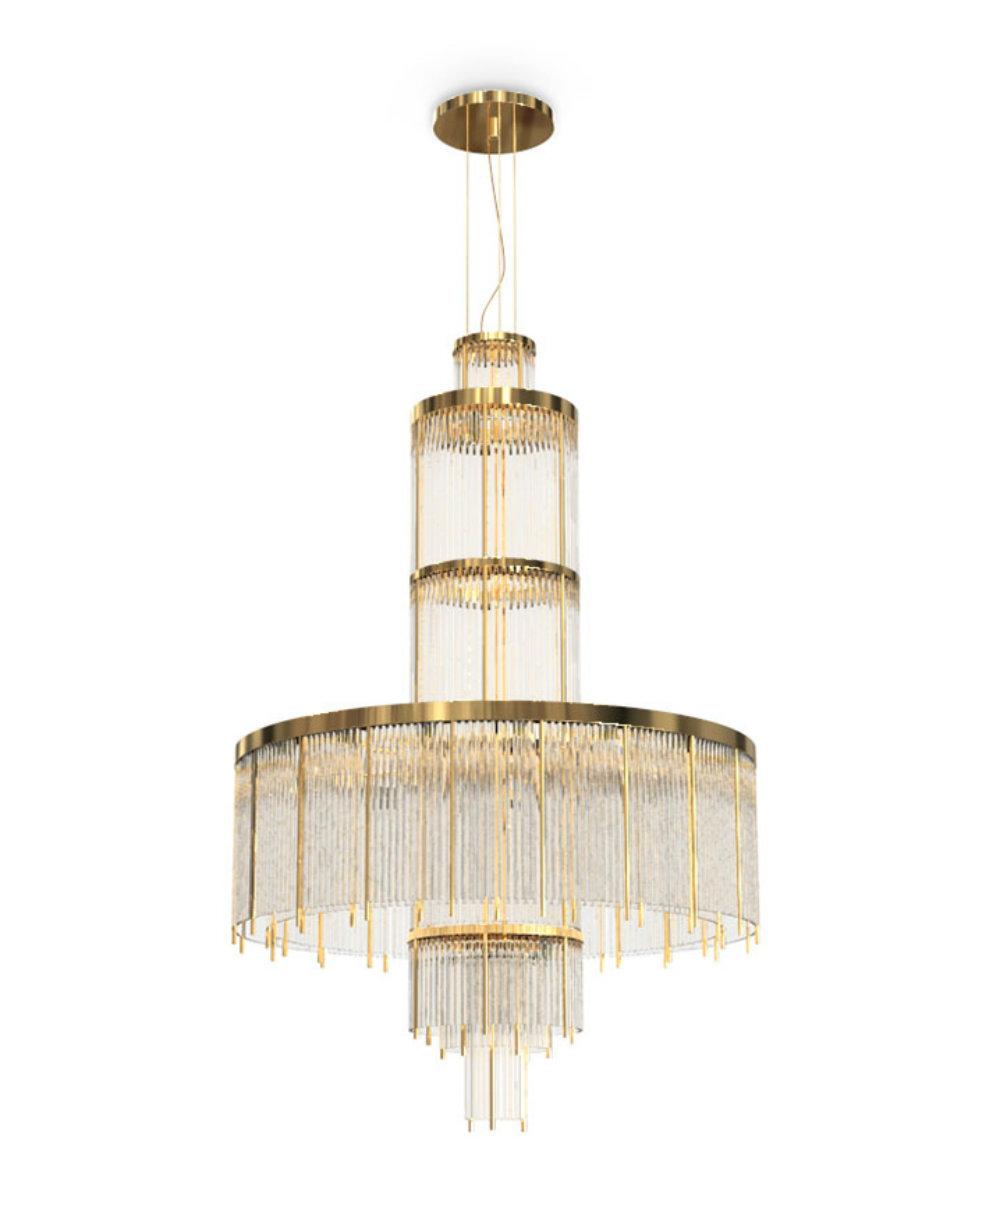 Lighting Inspiration: Meet the Pharo Collection